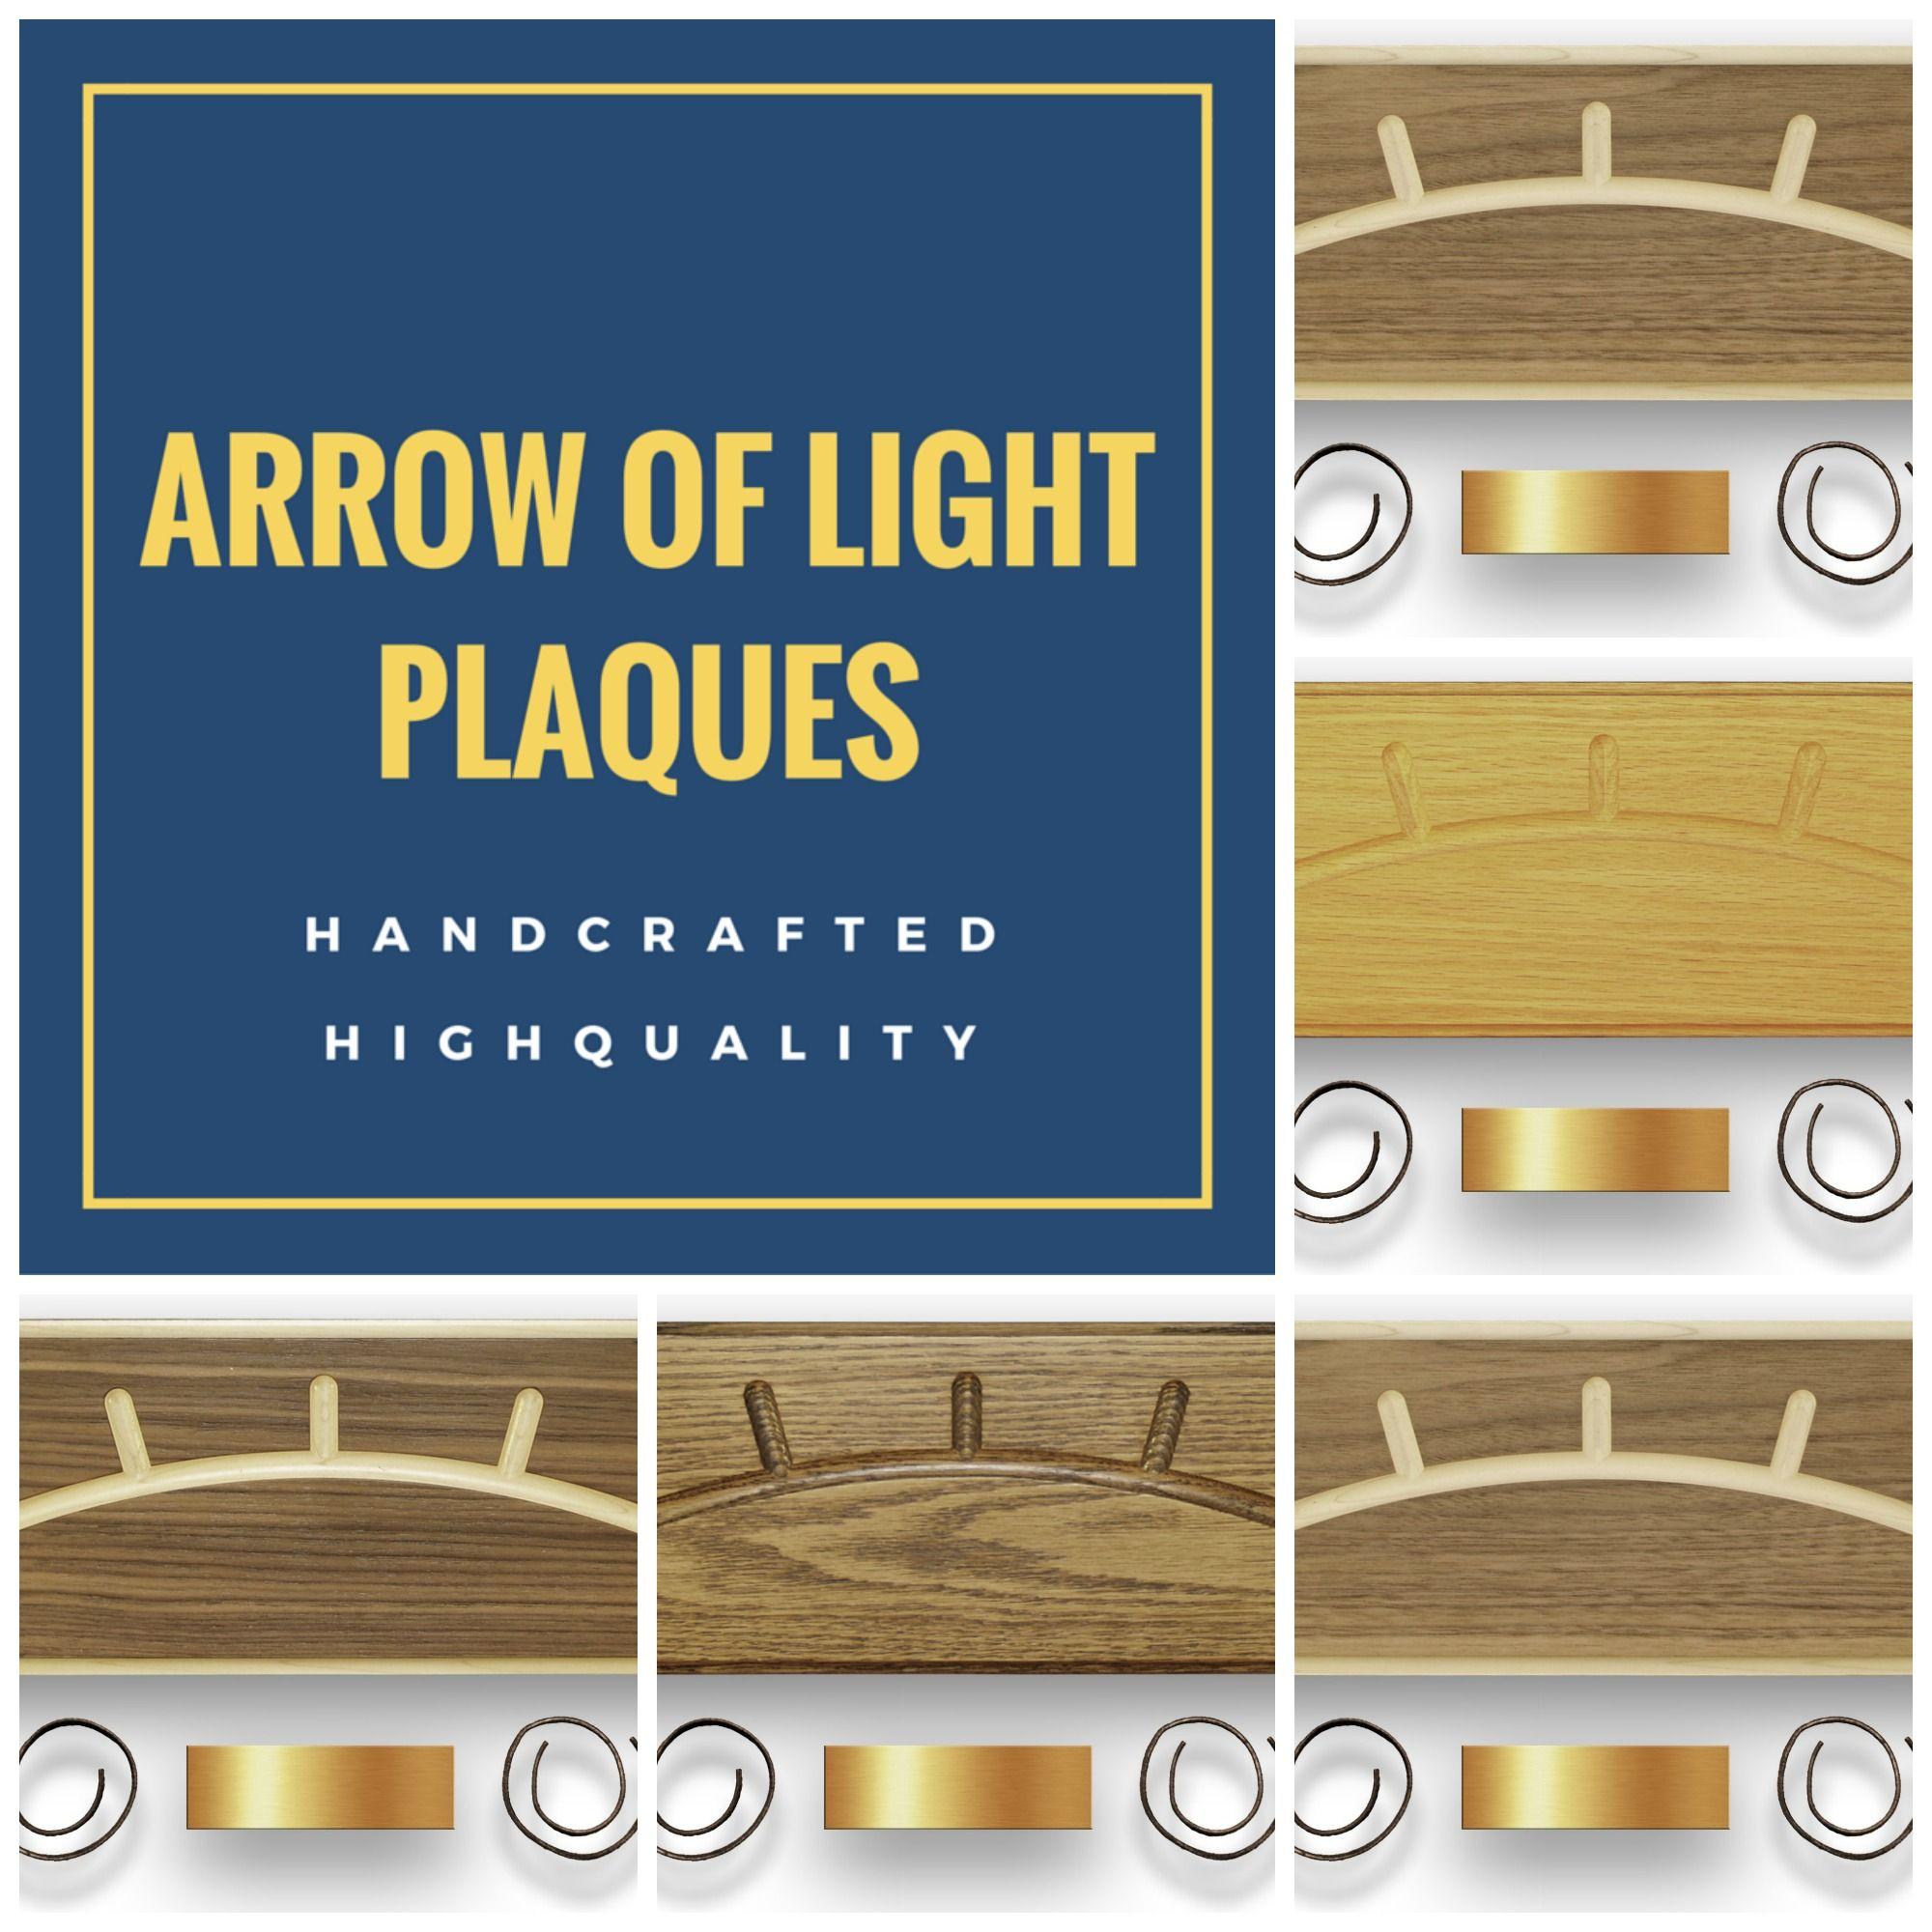 Pin On Diy Family Crafts Arrow of light award plaque kit